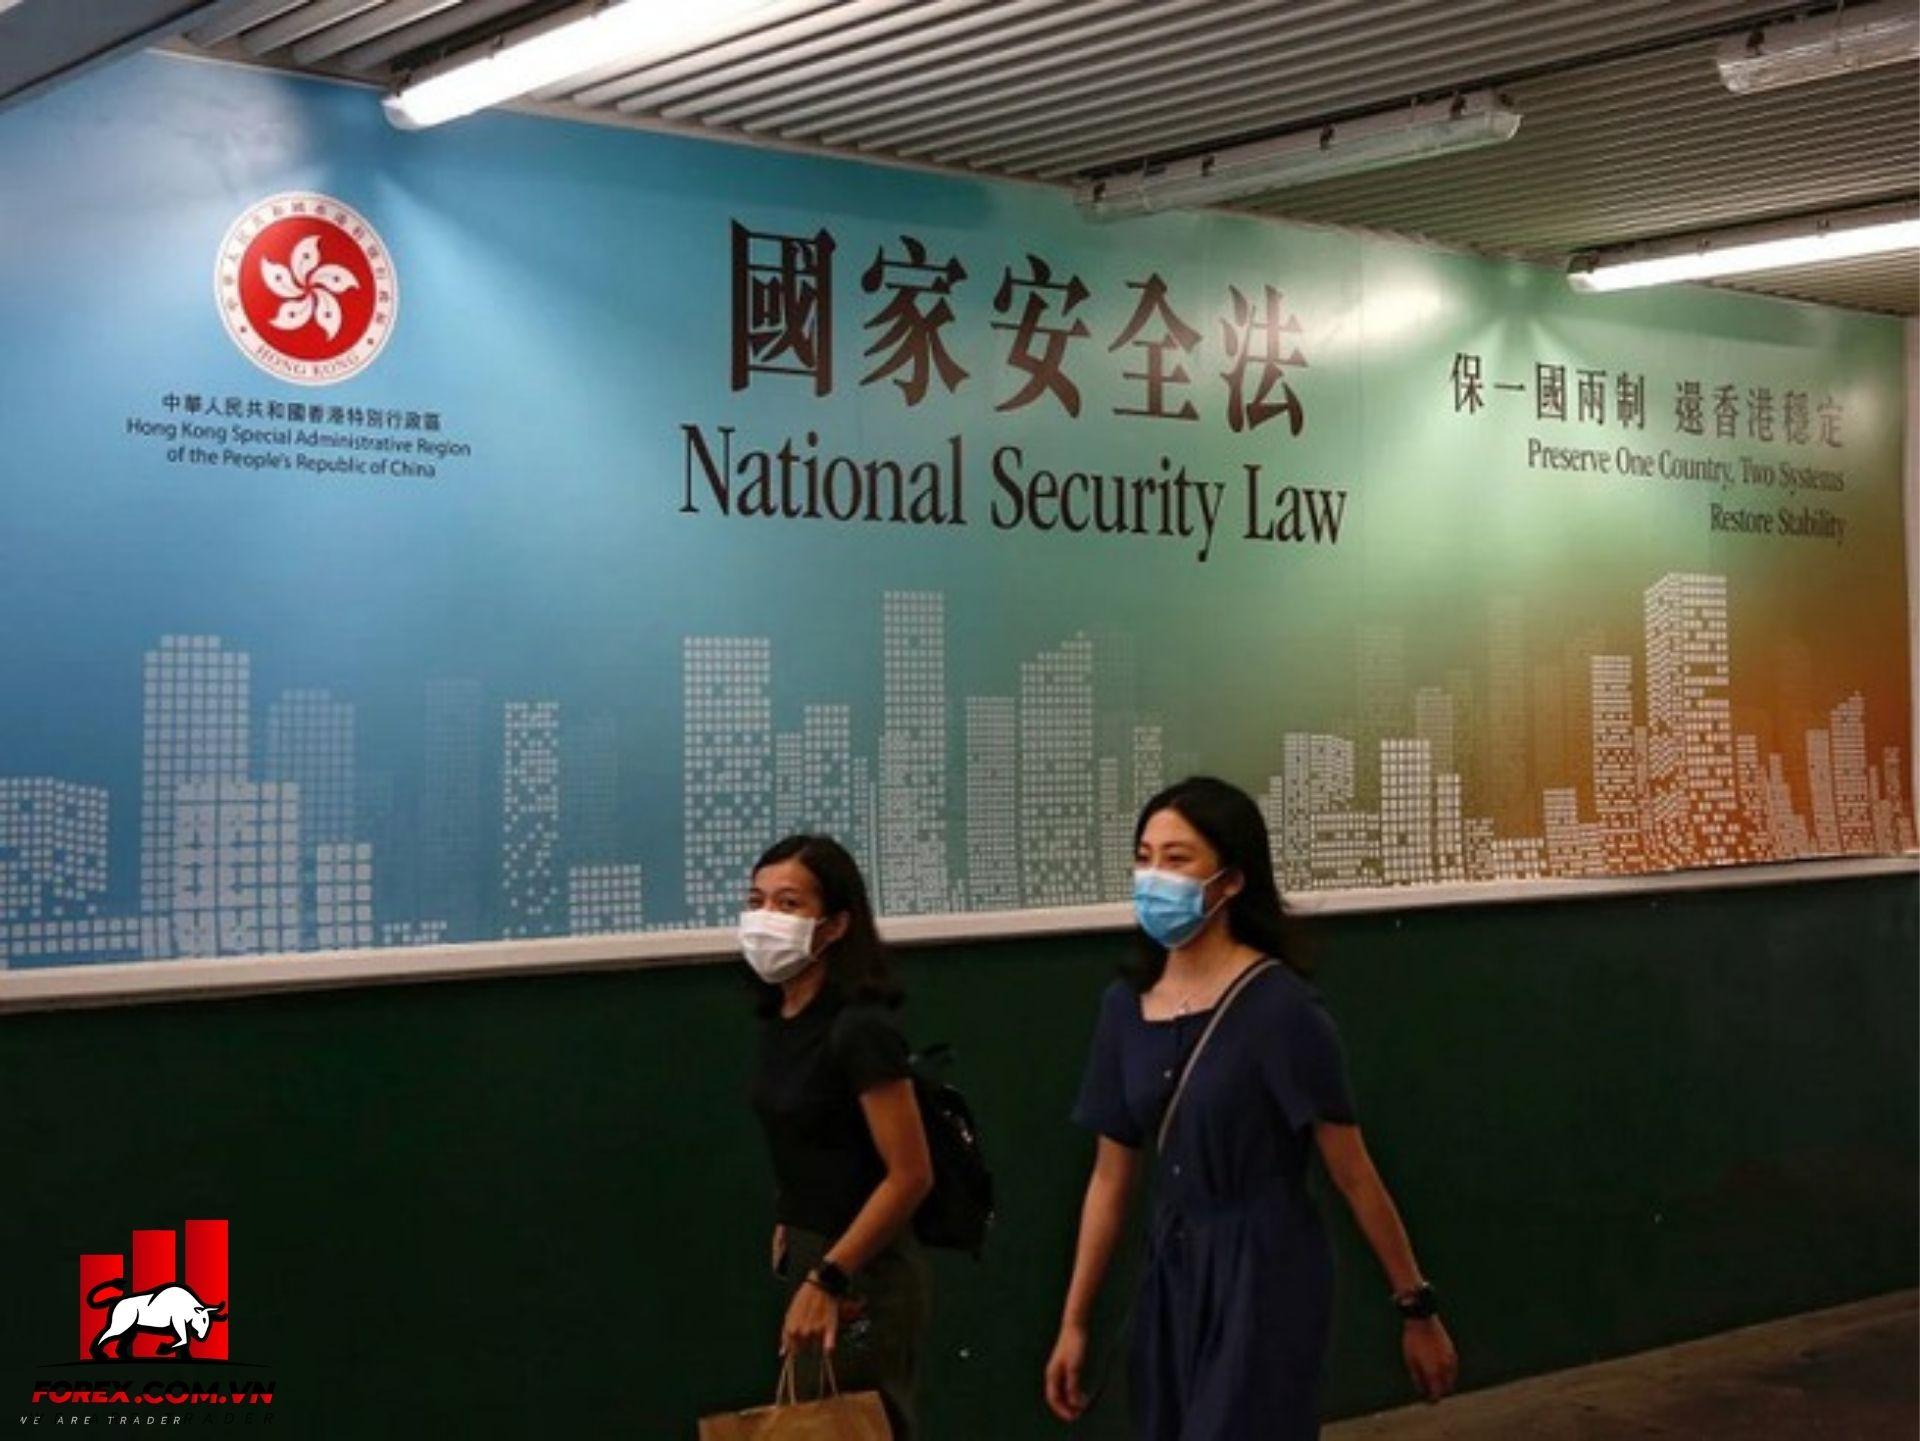 lien minh chau au se han che xuat khau sang Hong Kong dap tra luat an ning quoc gia cua trung quoc